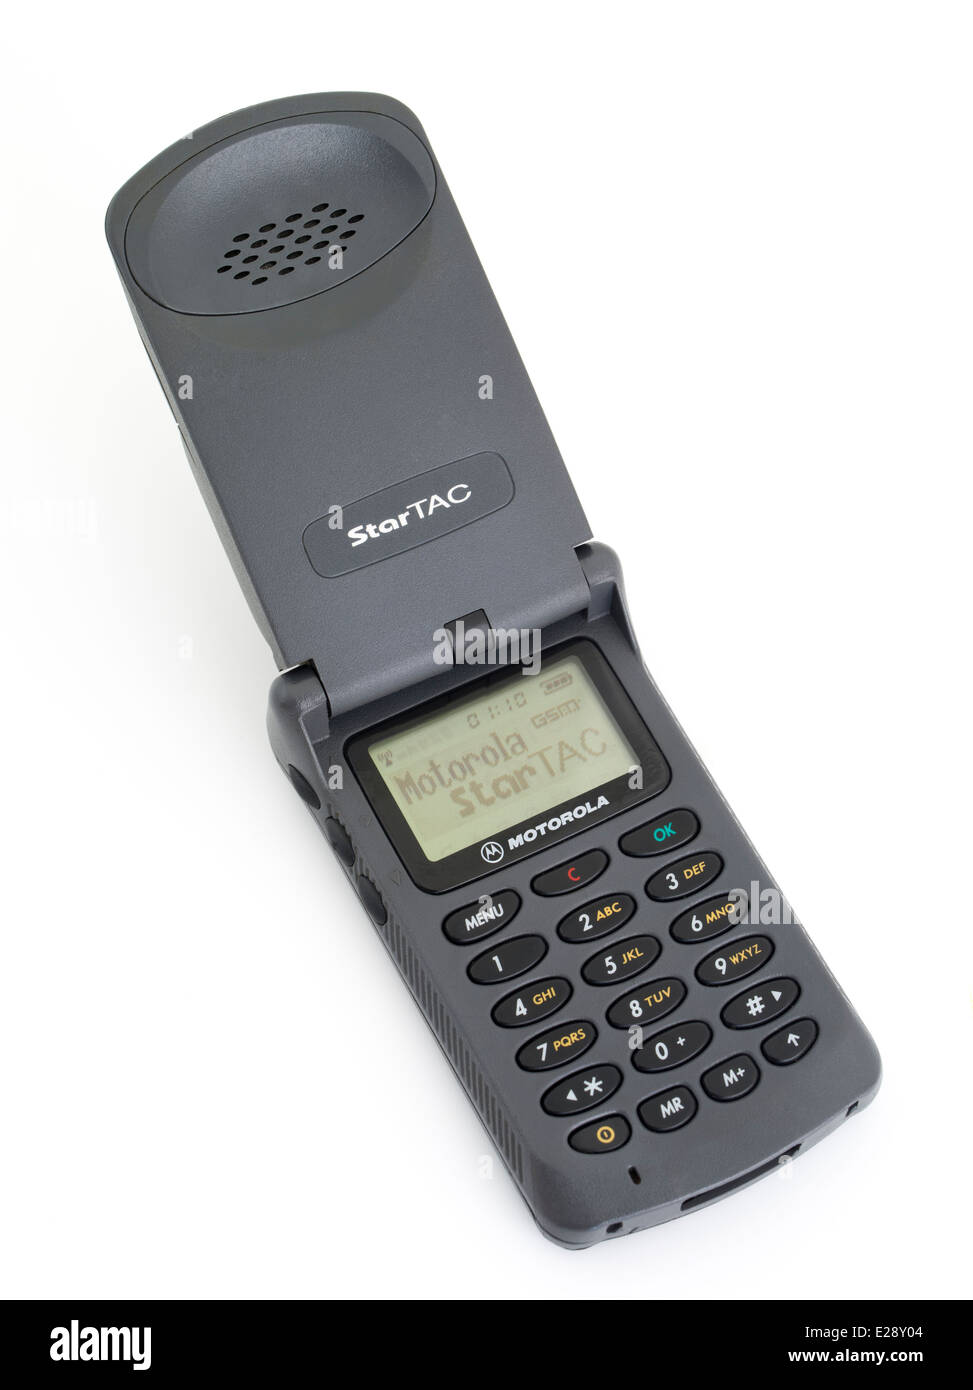 Motorola StarTAC star tac 85. Premier téléphone mobile Clamshell / flip 1996 parution Photo Stock